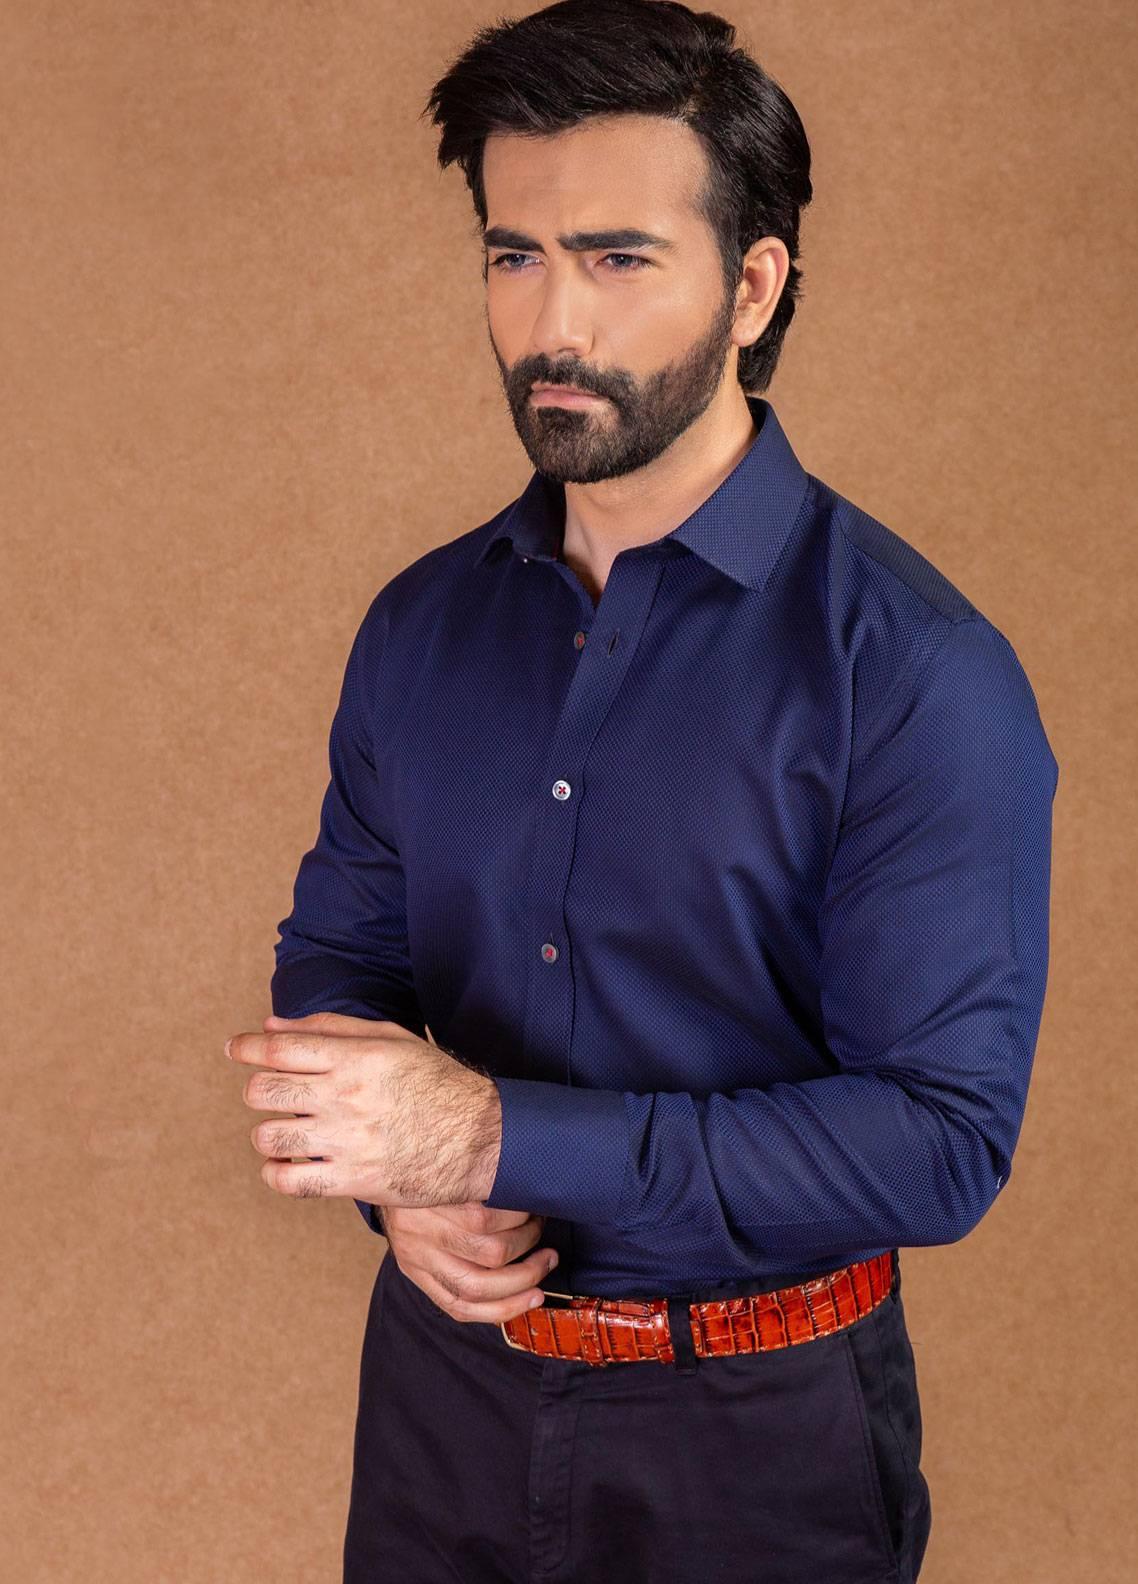 Brumano Cotton Formal Men Shirts - Navy Blue BRM-562